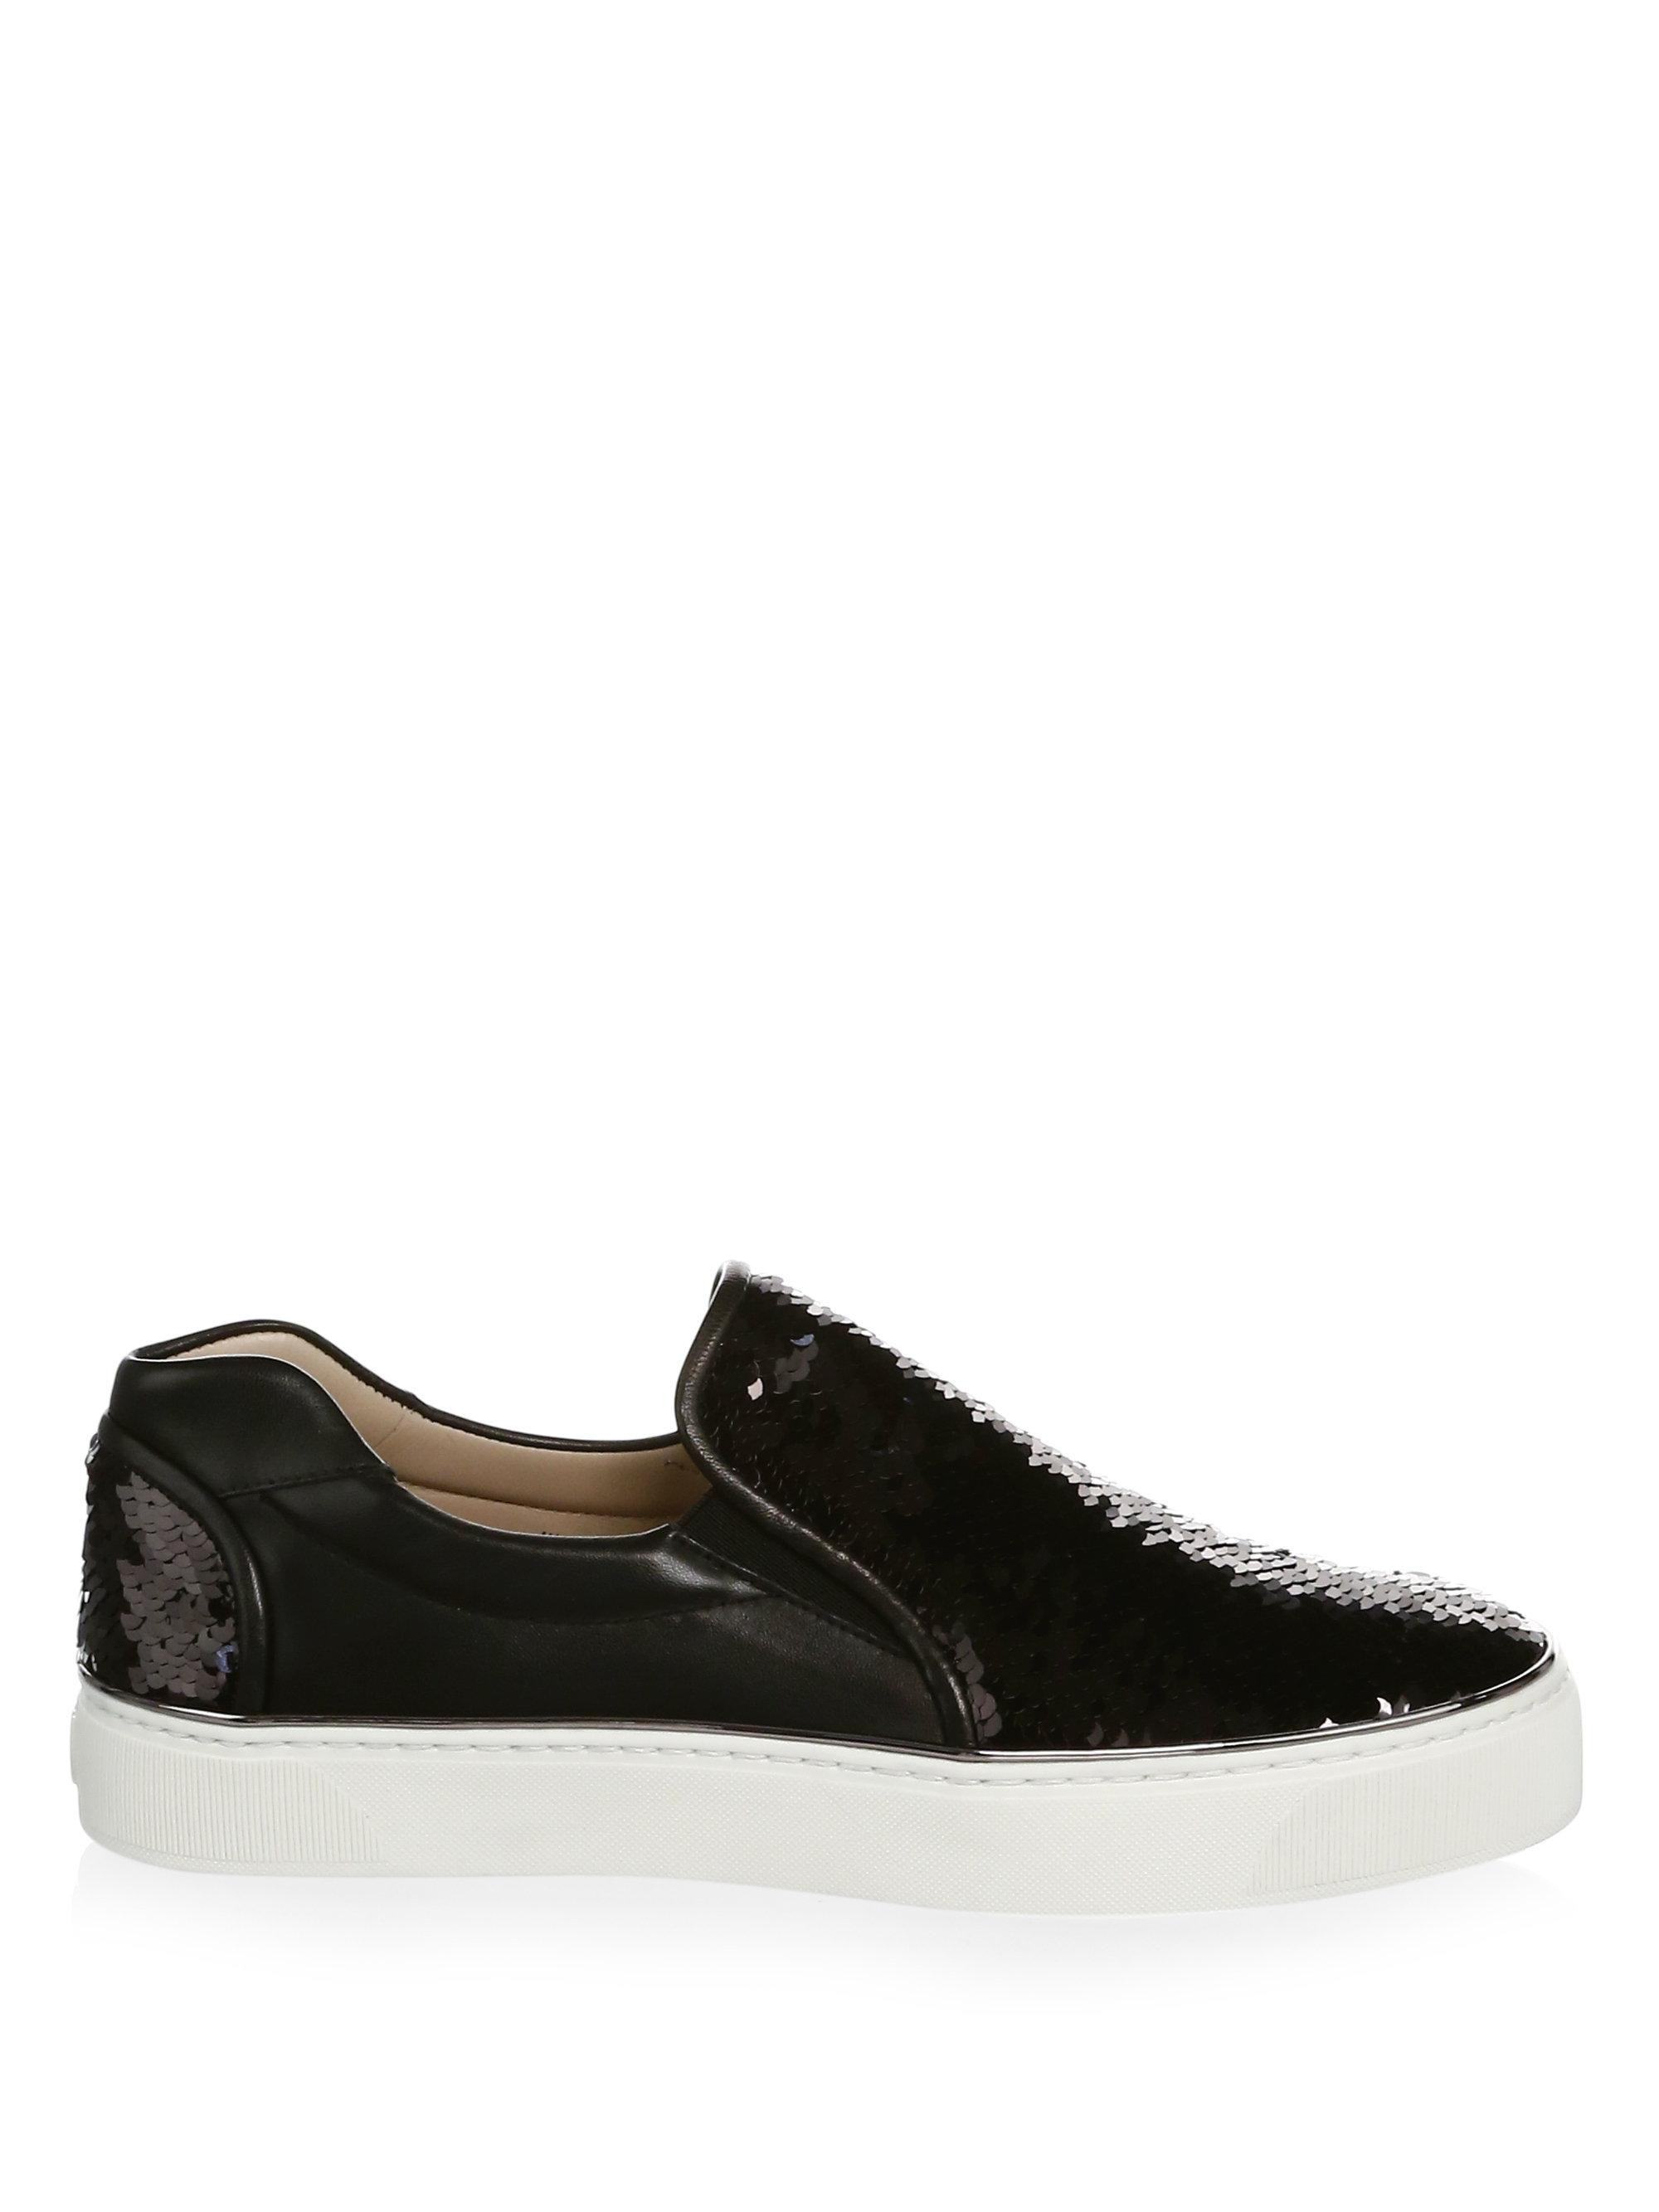 Stuart Weitzman Sequined Leather Sneakers yMzFzZA